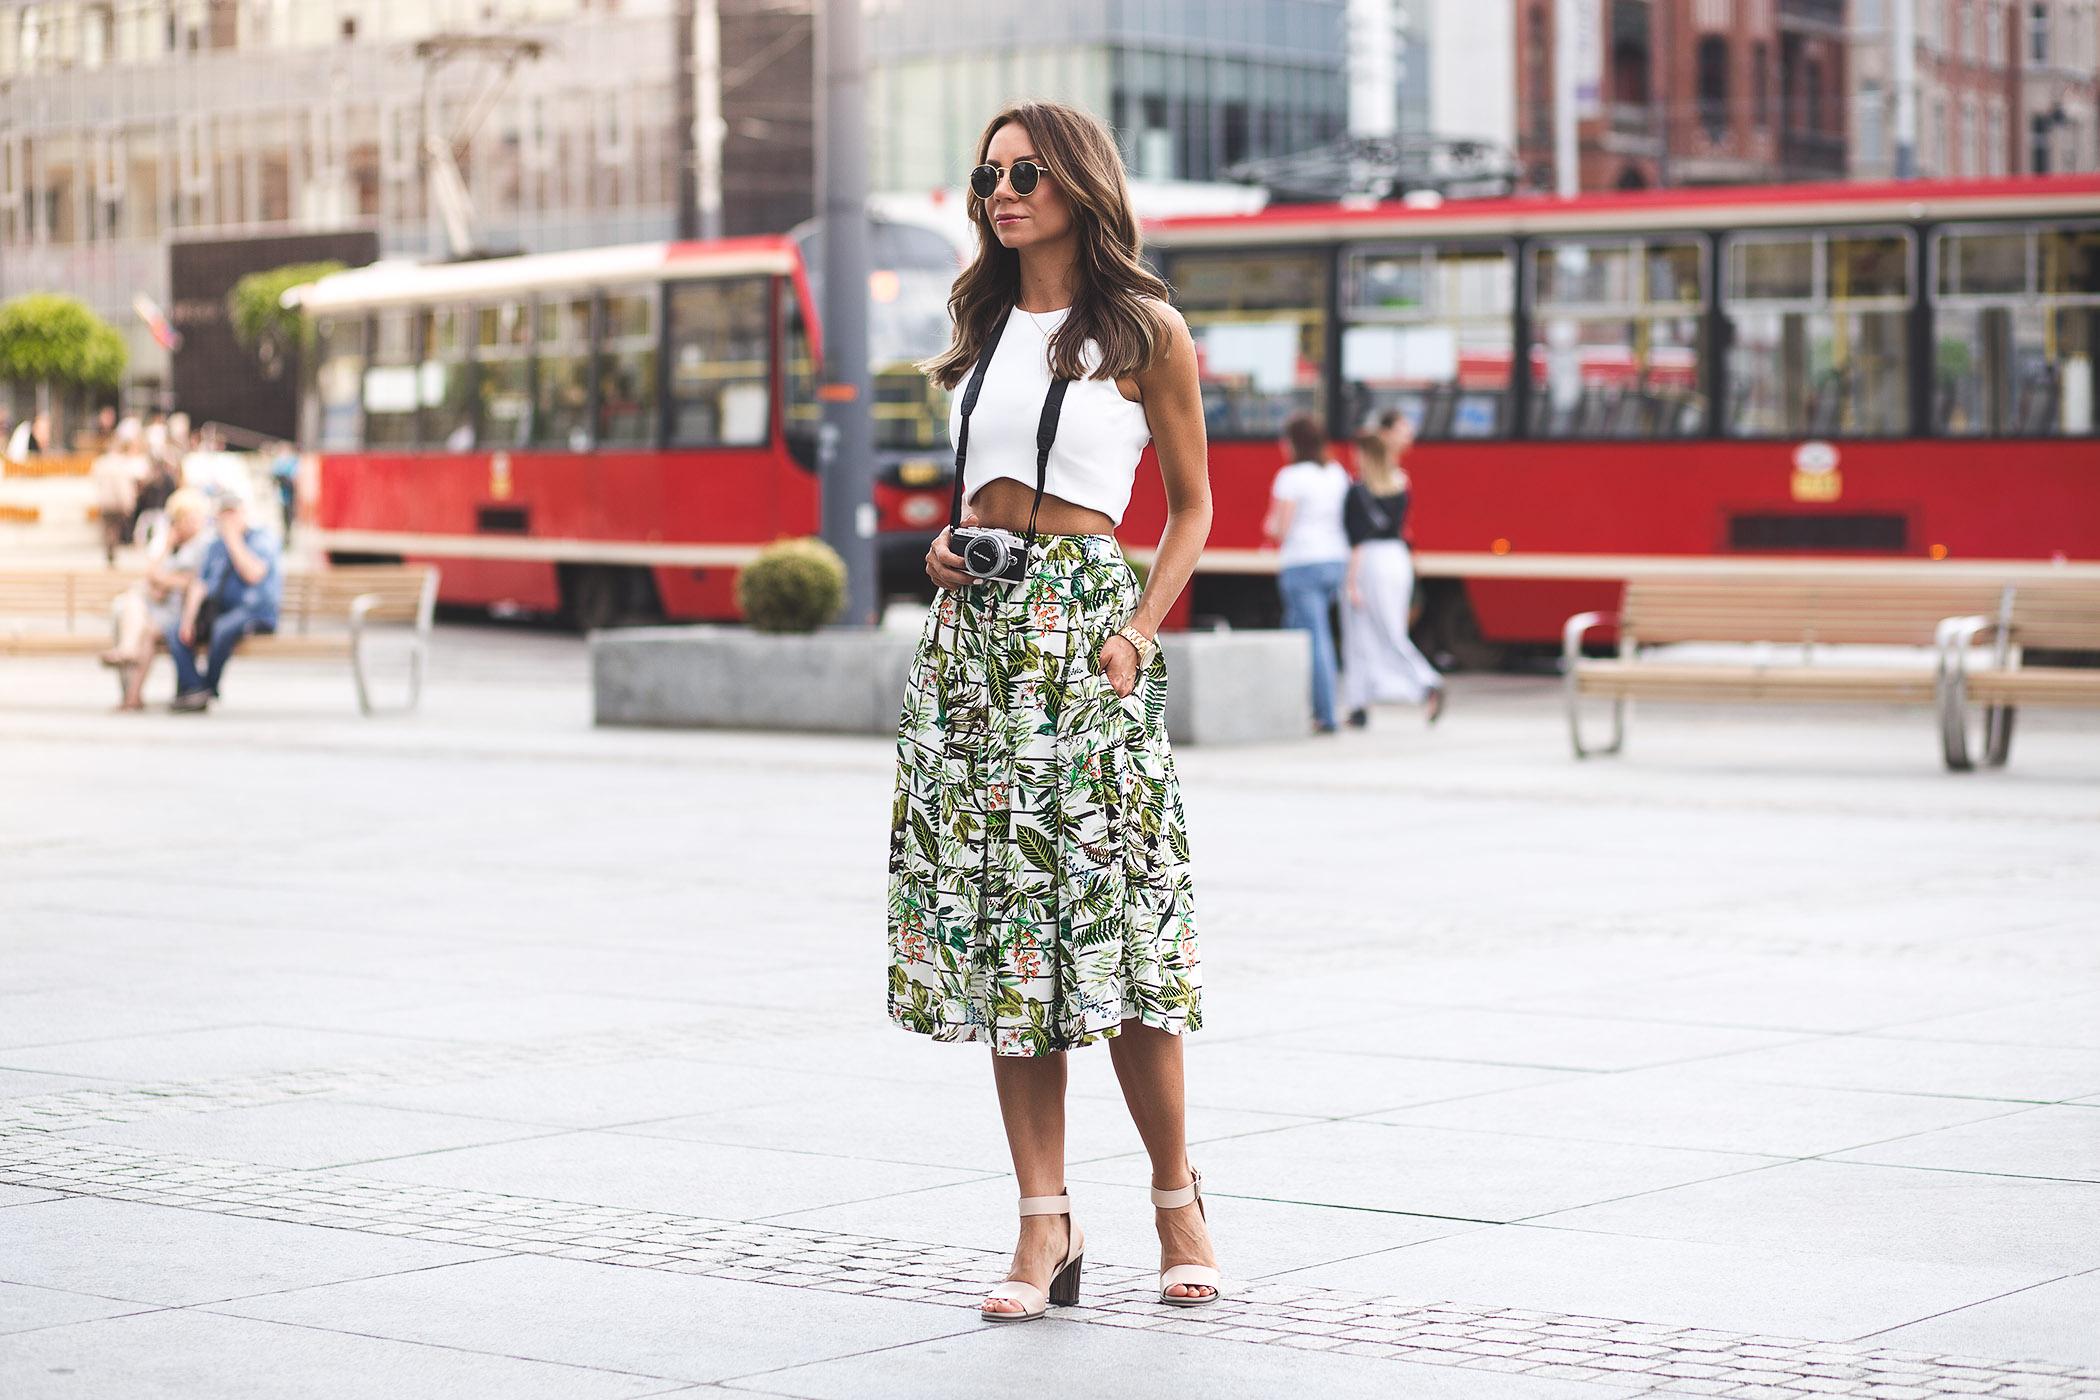 Olivka blog, modna mama, nz poland, sandały ryłko, katowice centrum